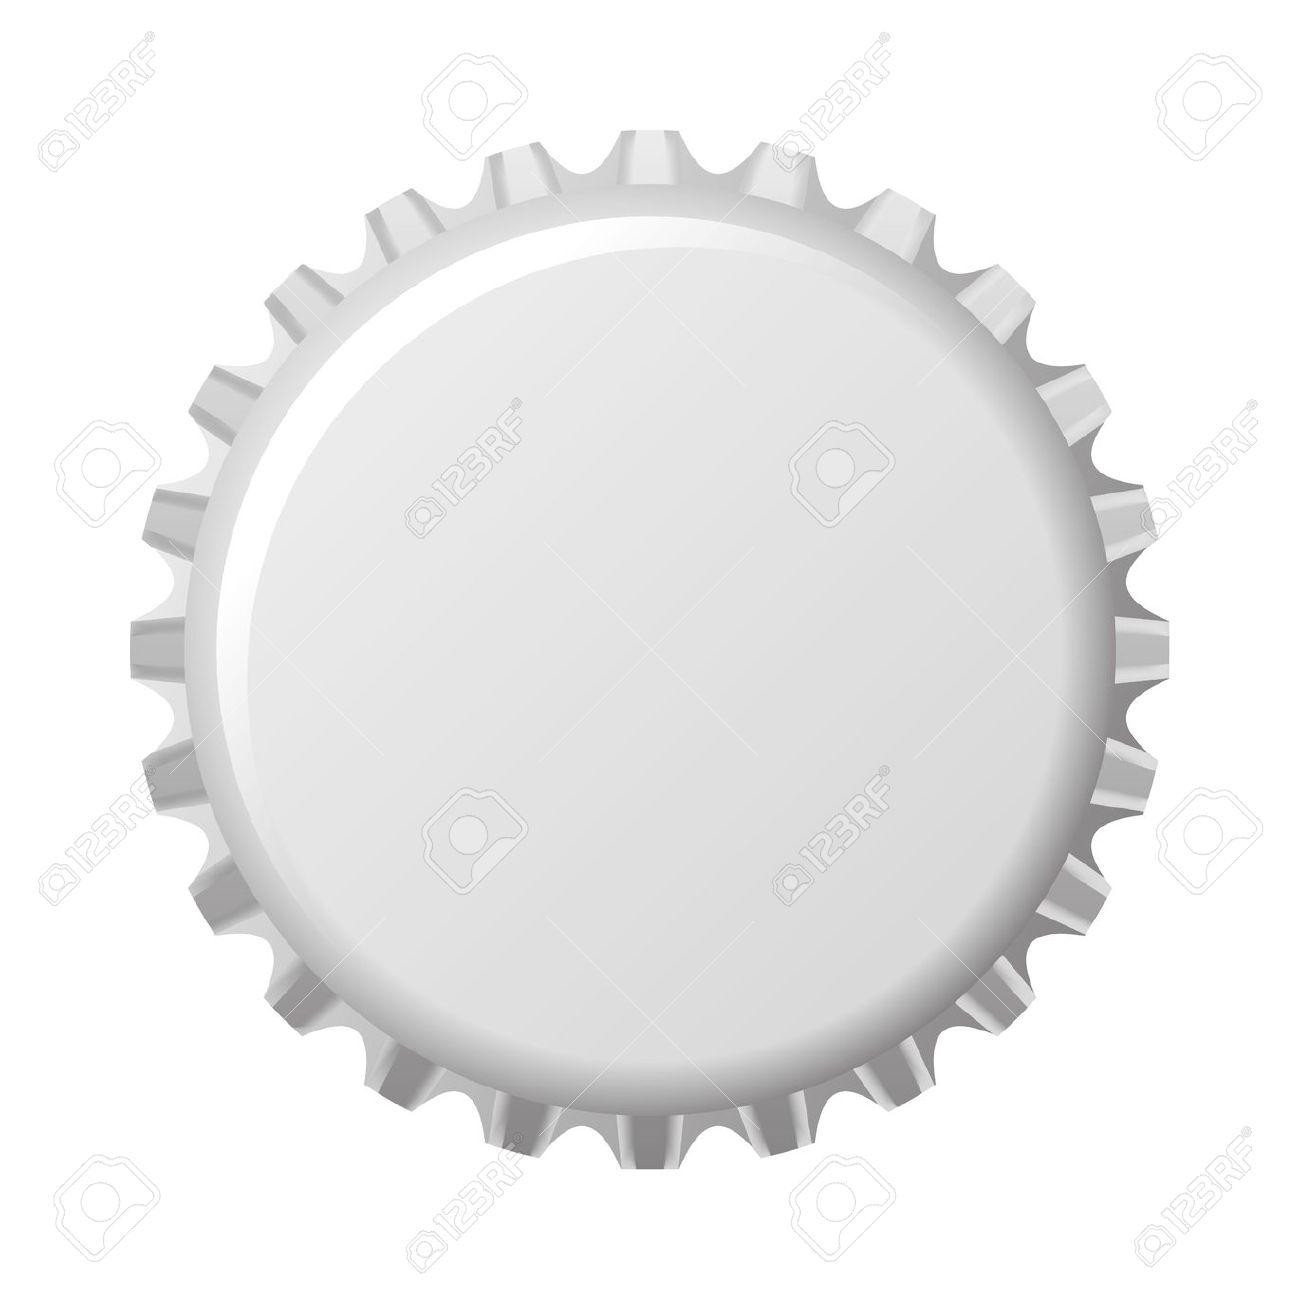 An Image Of A Nice Bottle Cap .-An image of a nice bottle cap .-17